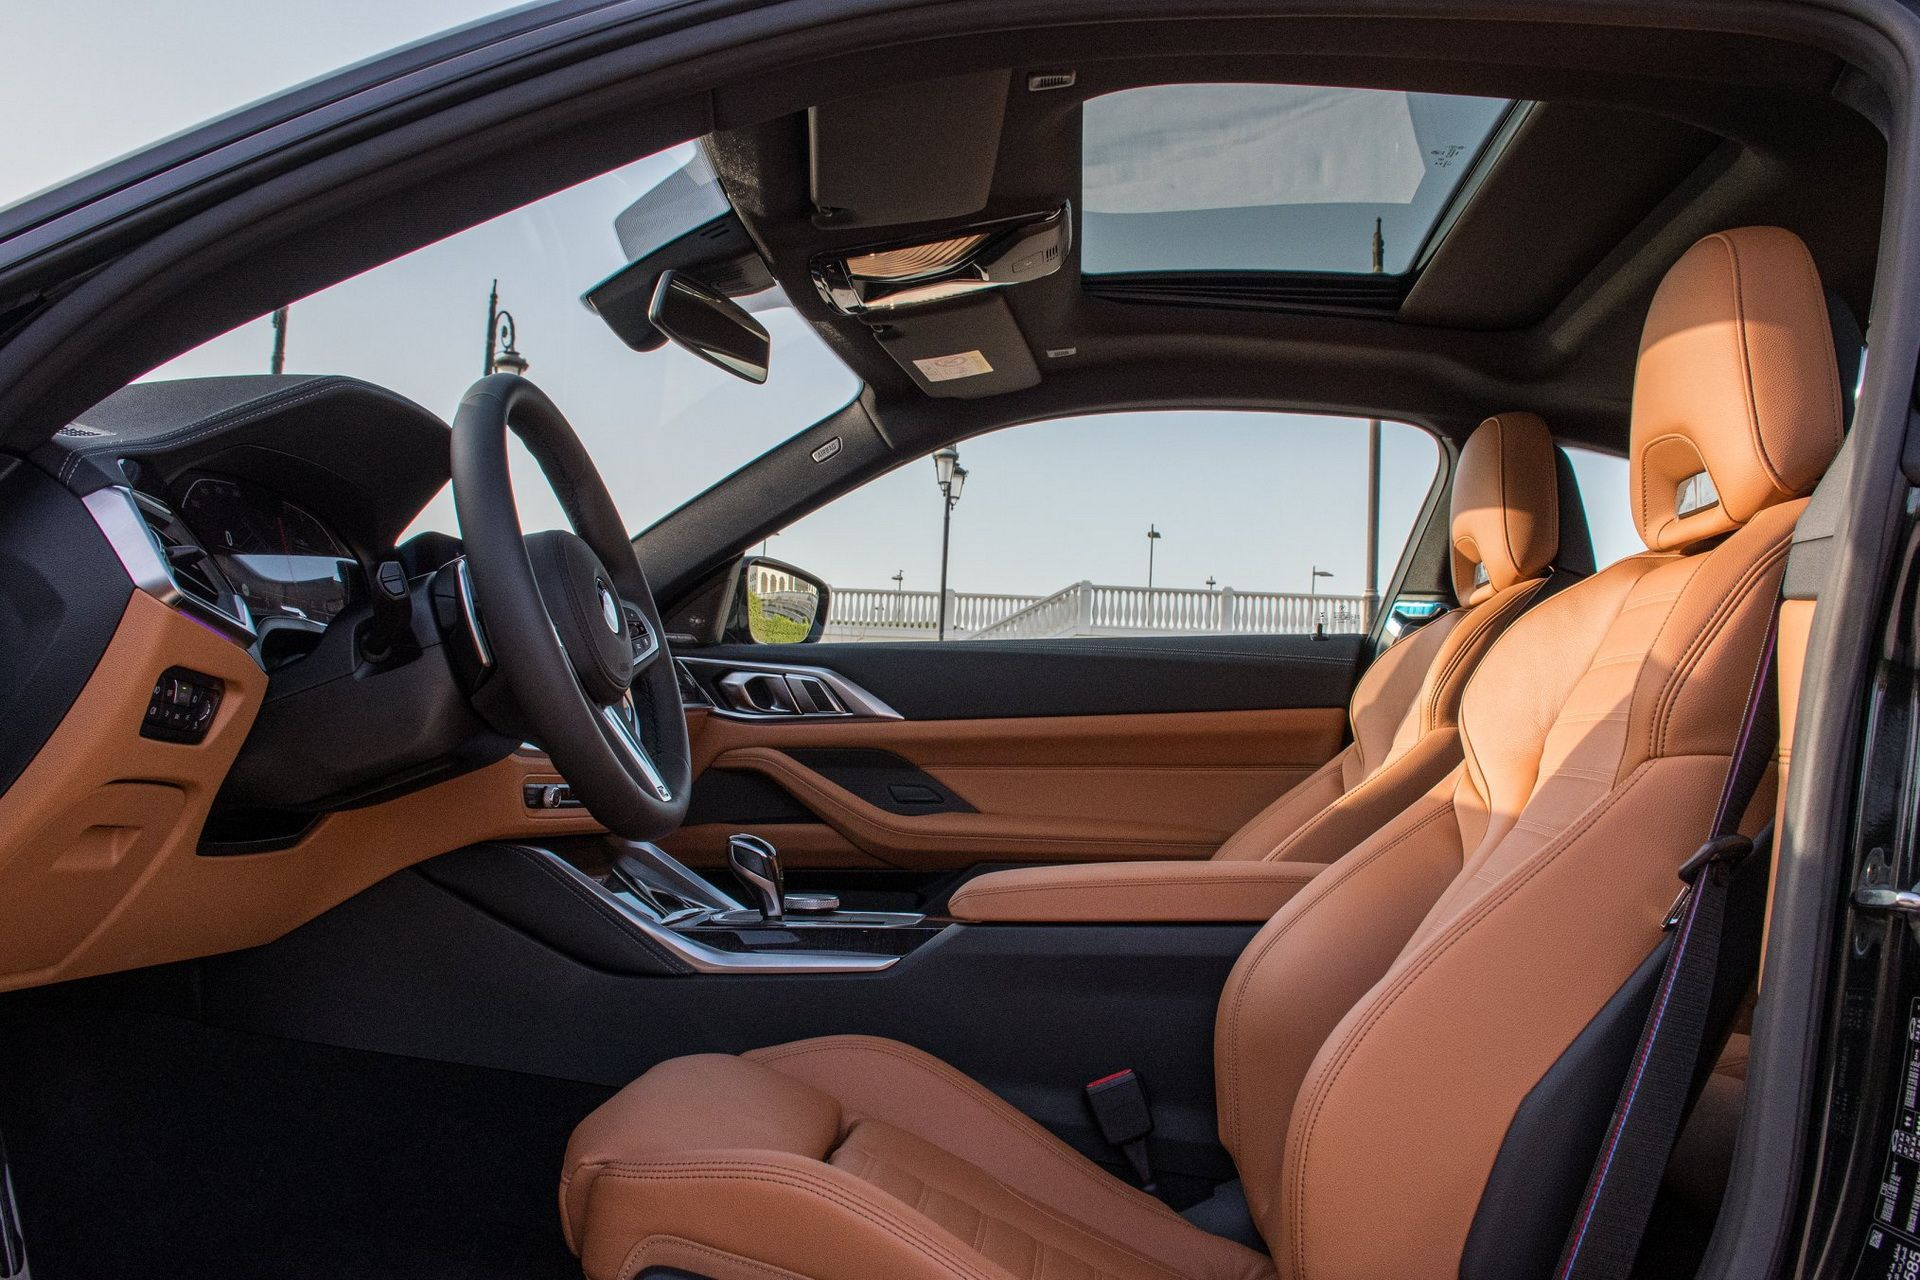 2021_BMW_4-Series_Coupe_Dark_Edition_UAE_0019